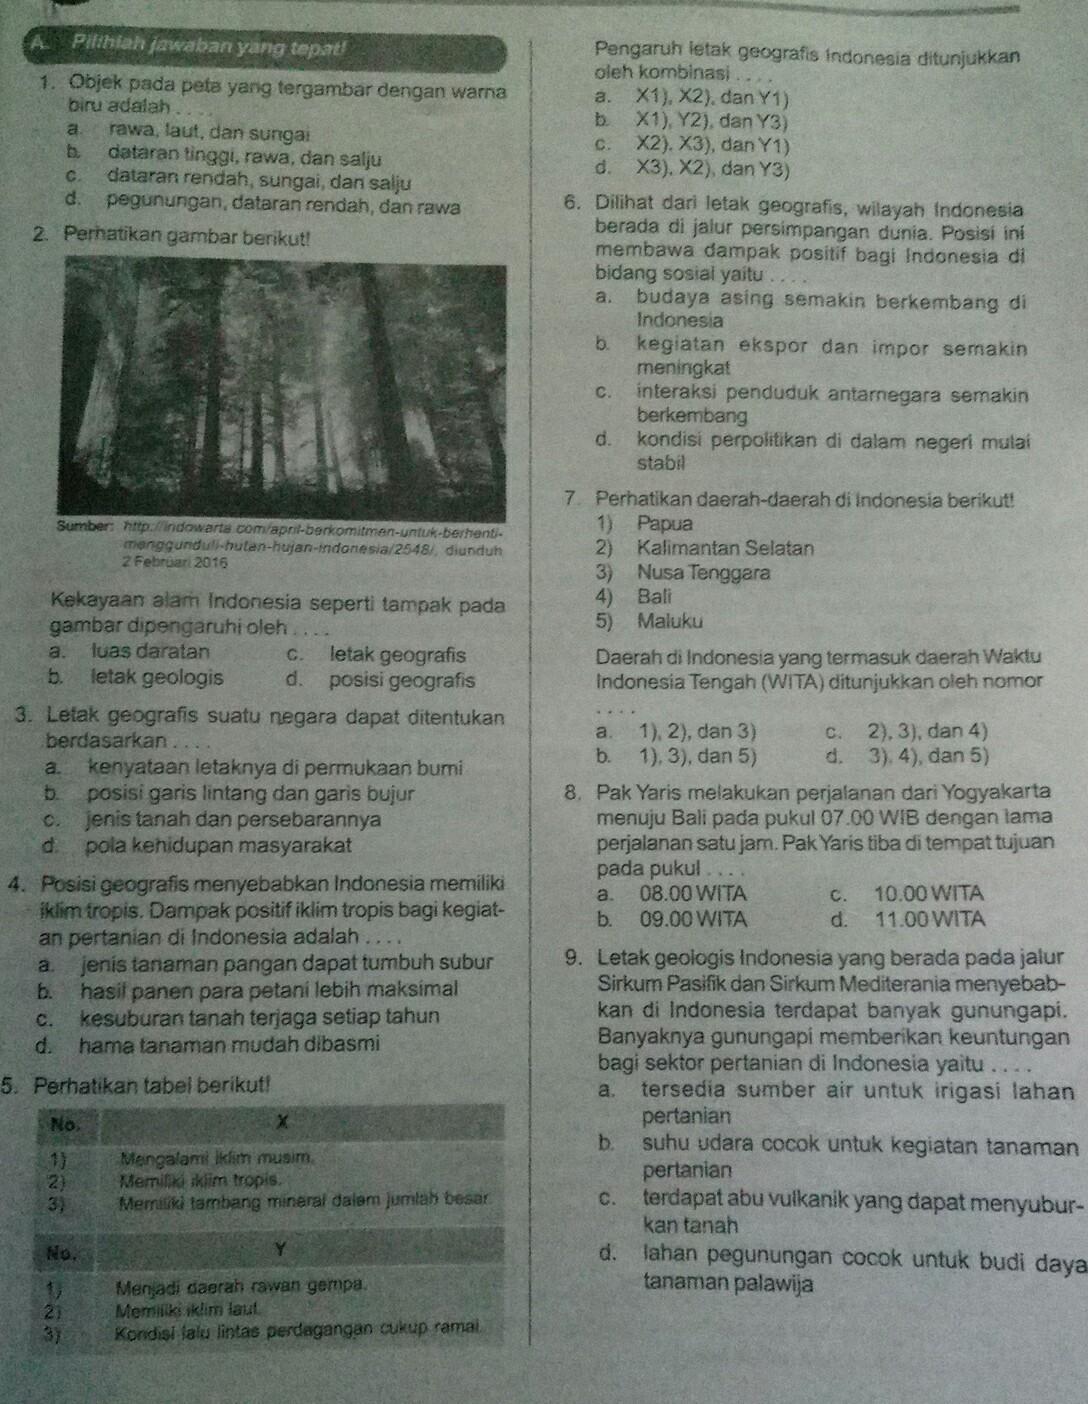 Kunci Jawaban Lks Ips Kelas 7 Semester 2 Kurikulum 2013 Ilmusosial Id